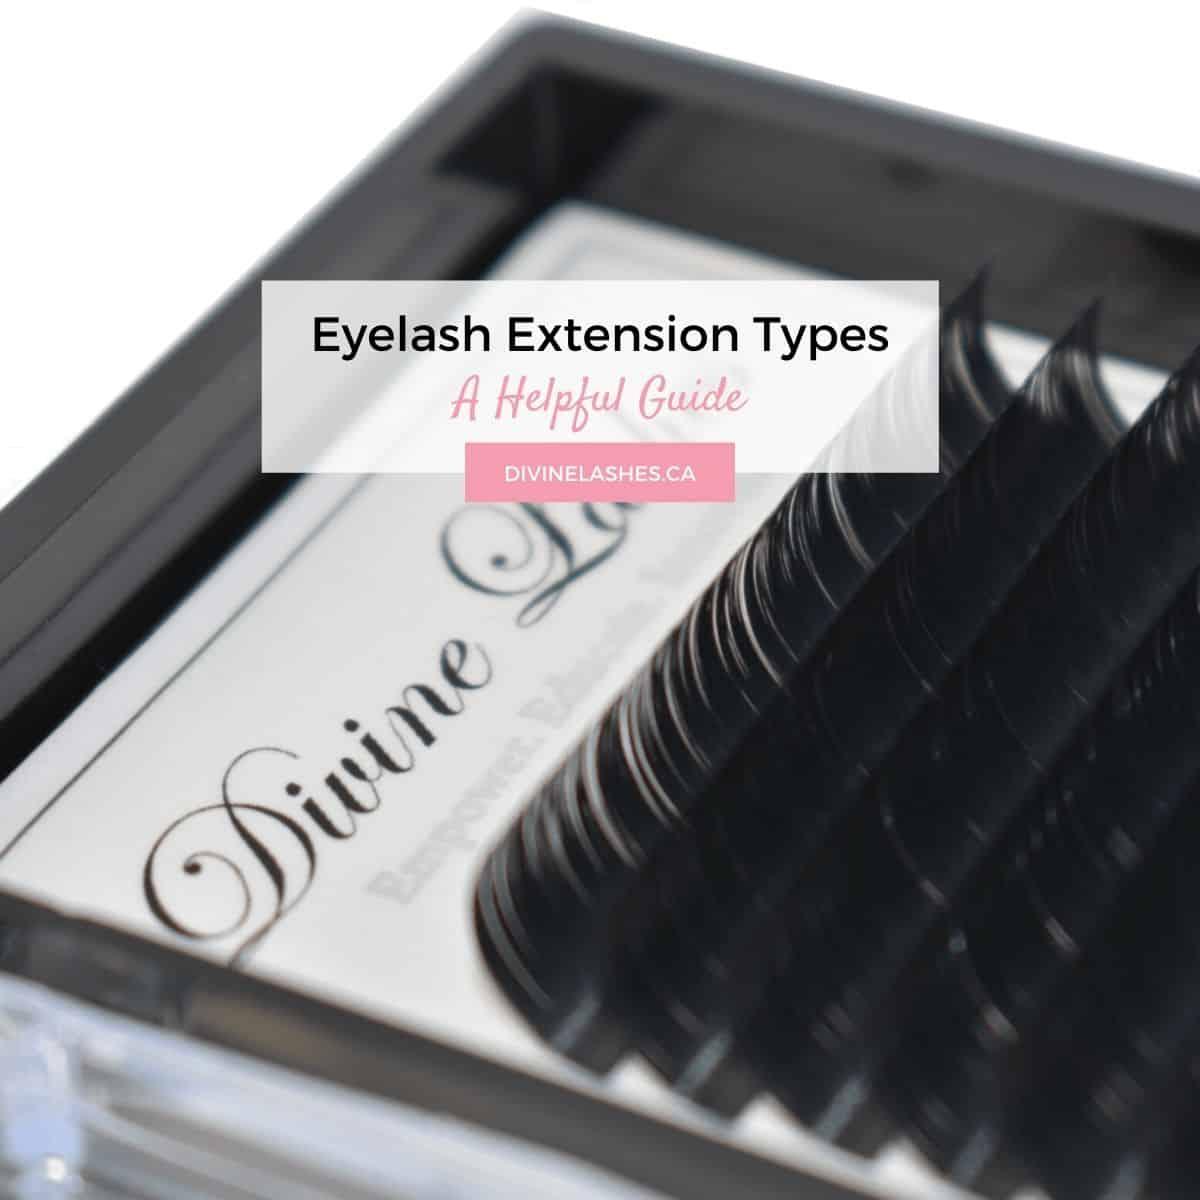 Eyelash tray with several types of eyelash extensions